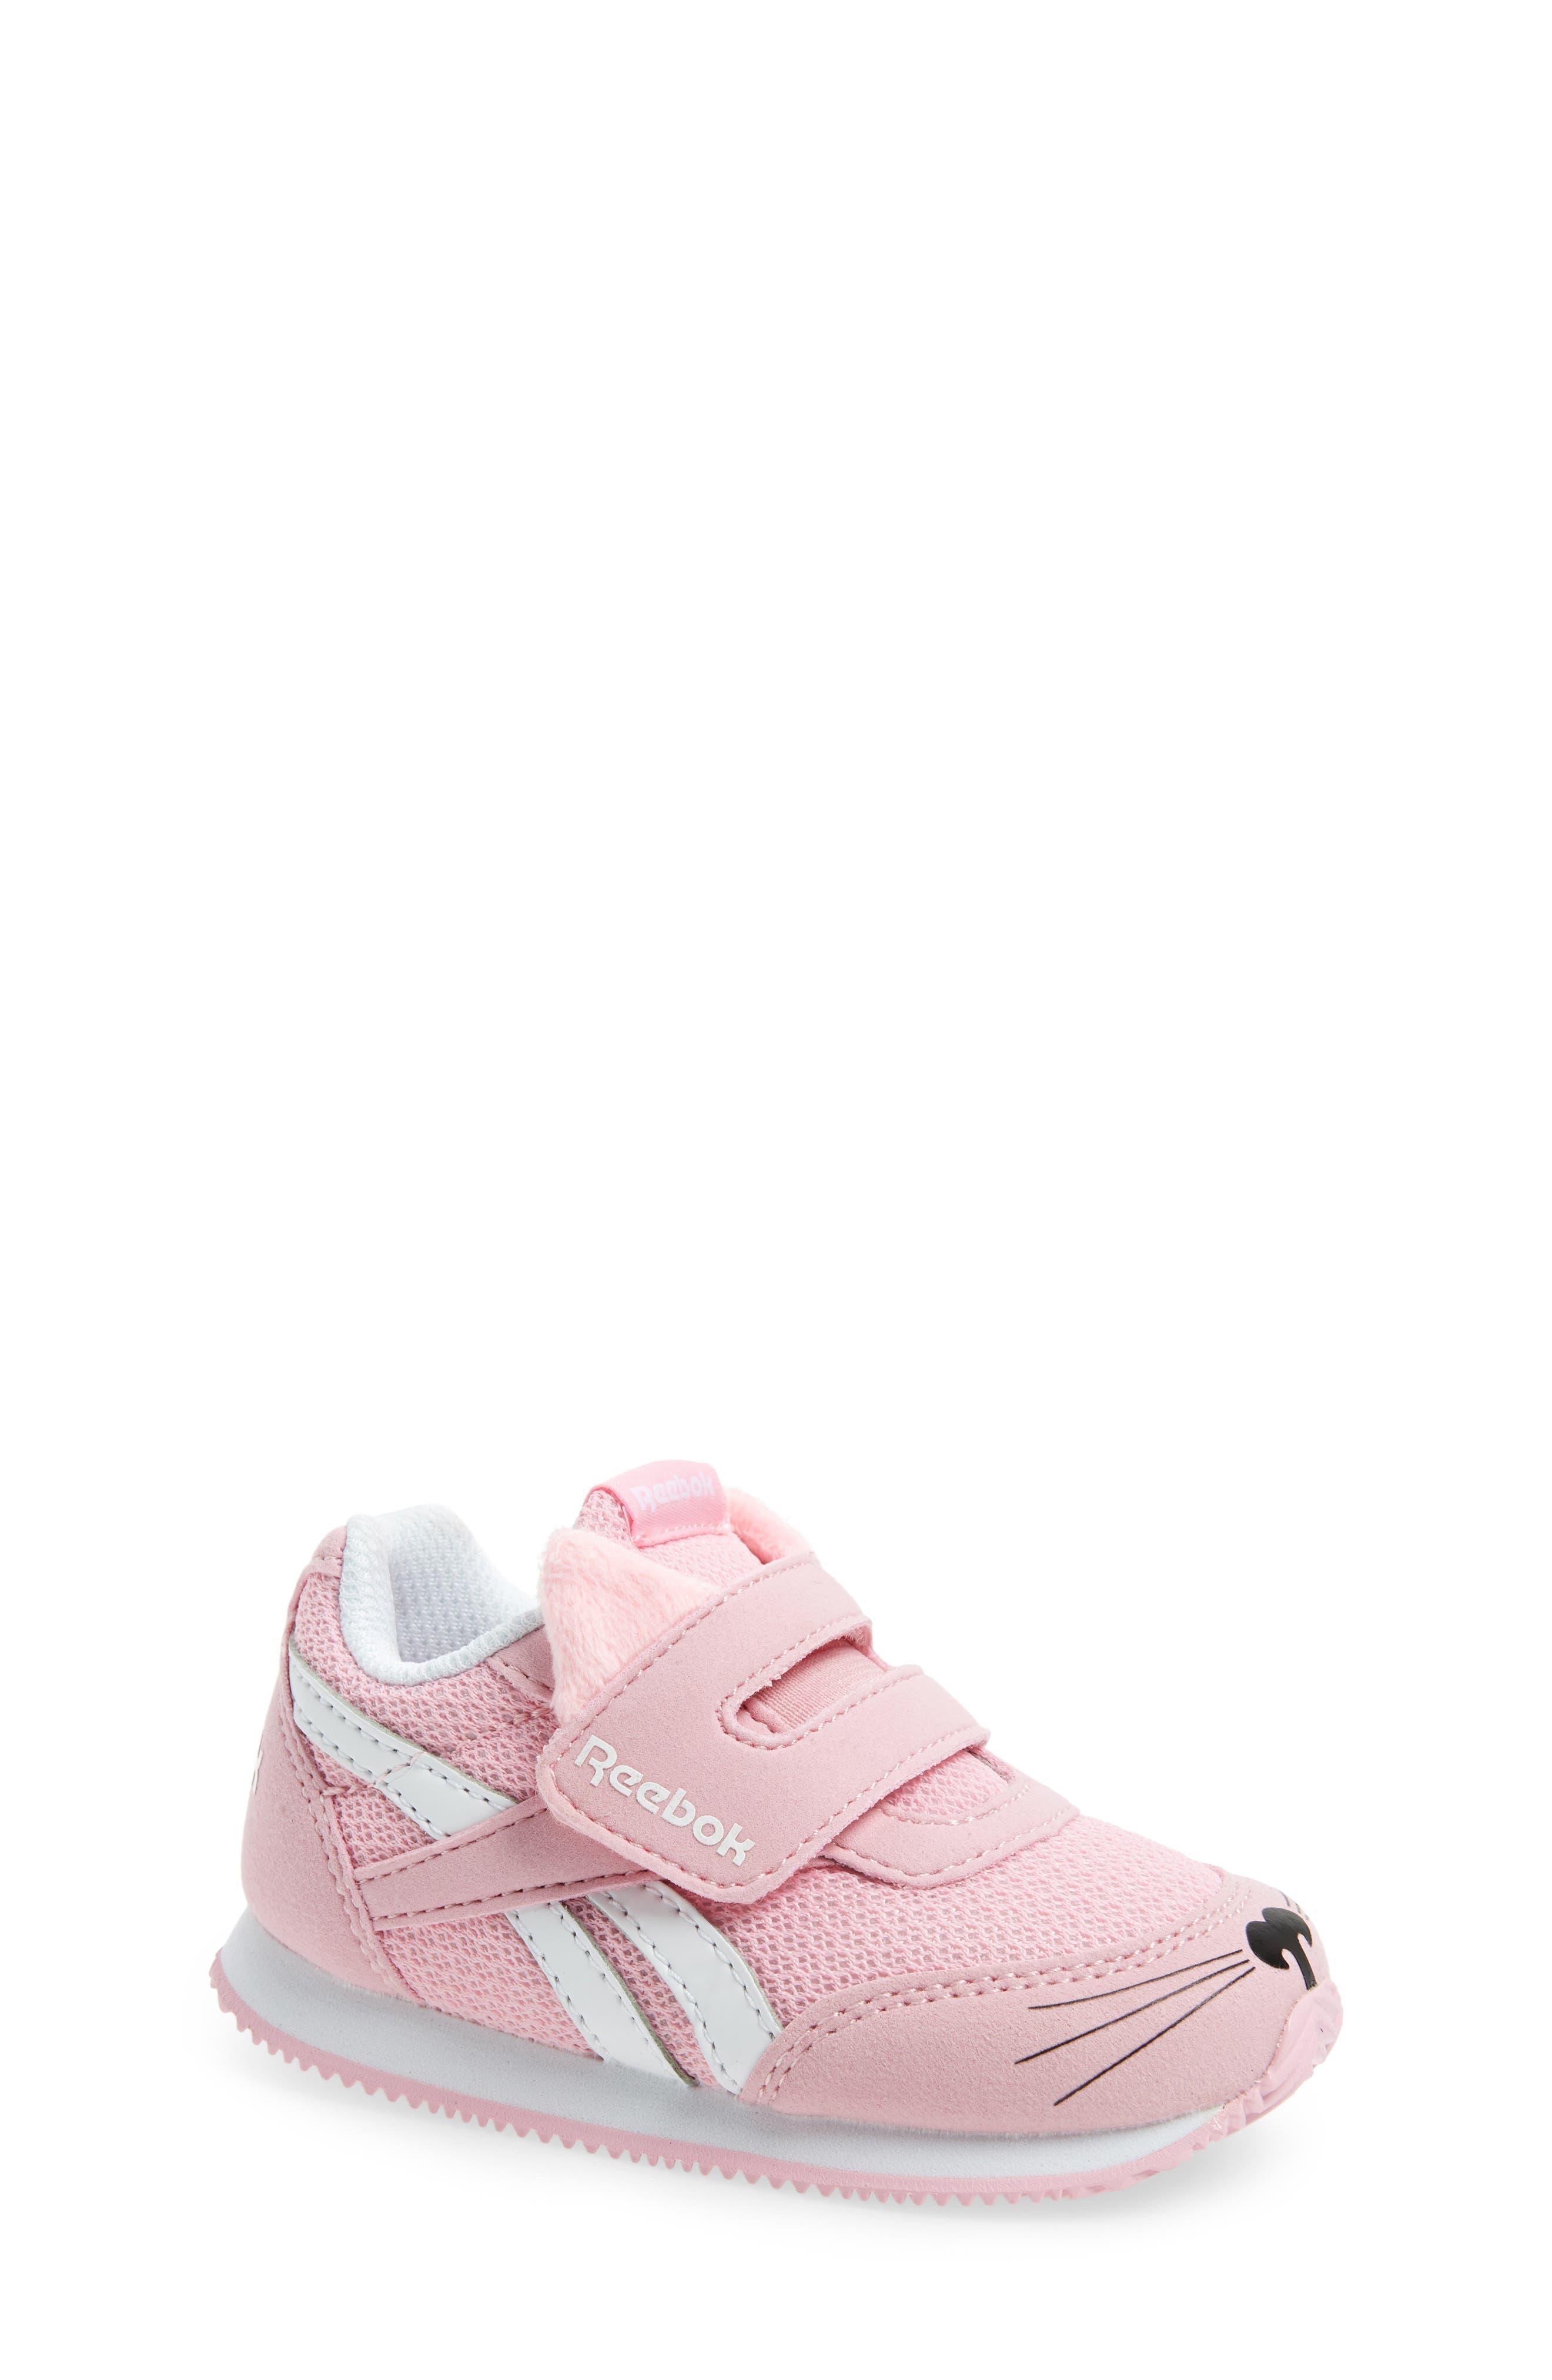 Royal Classic Jogger 2 Sneaker,                             Main thumbnail 1, color,                             100